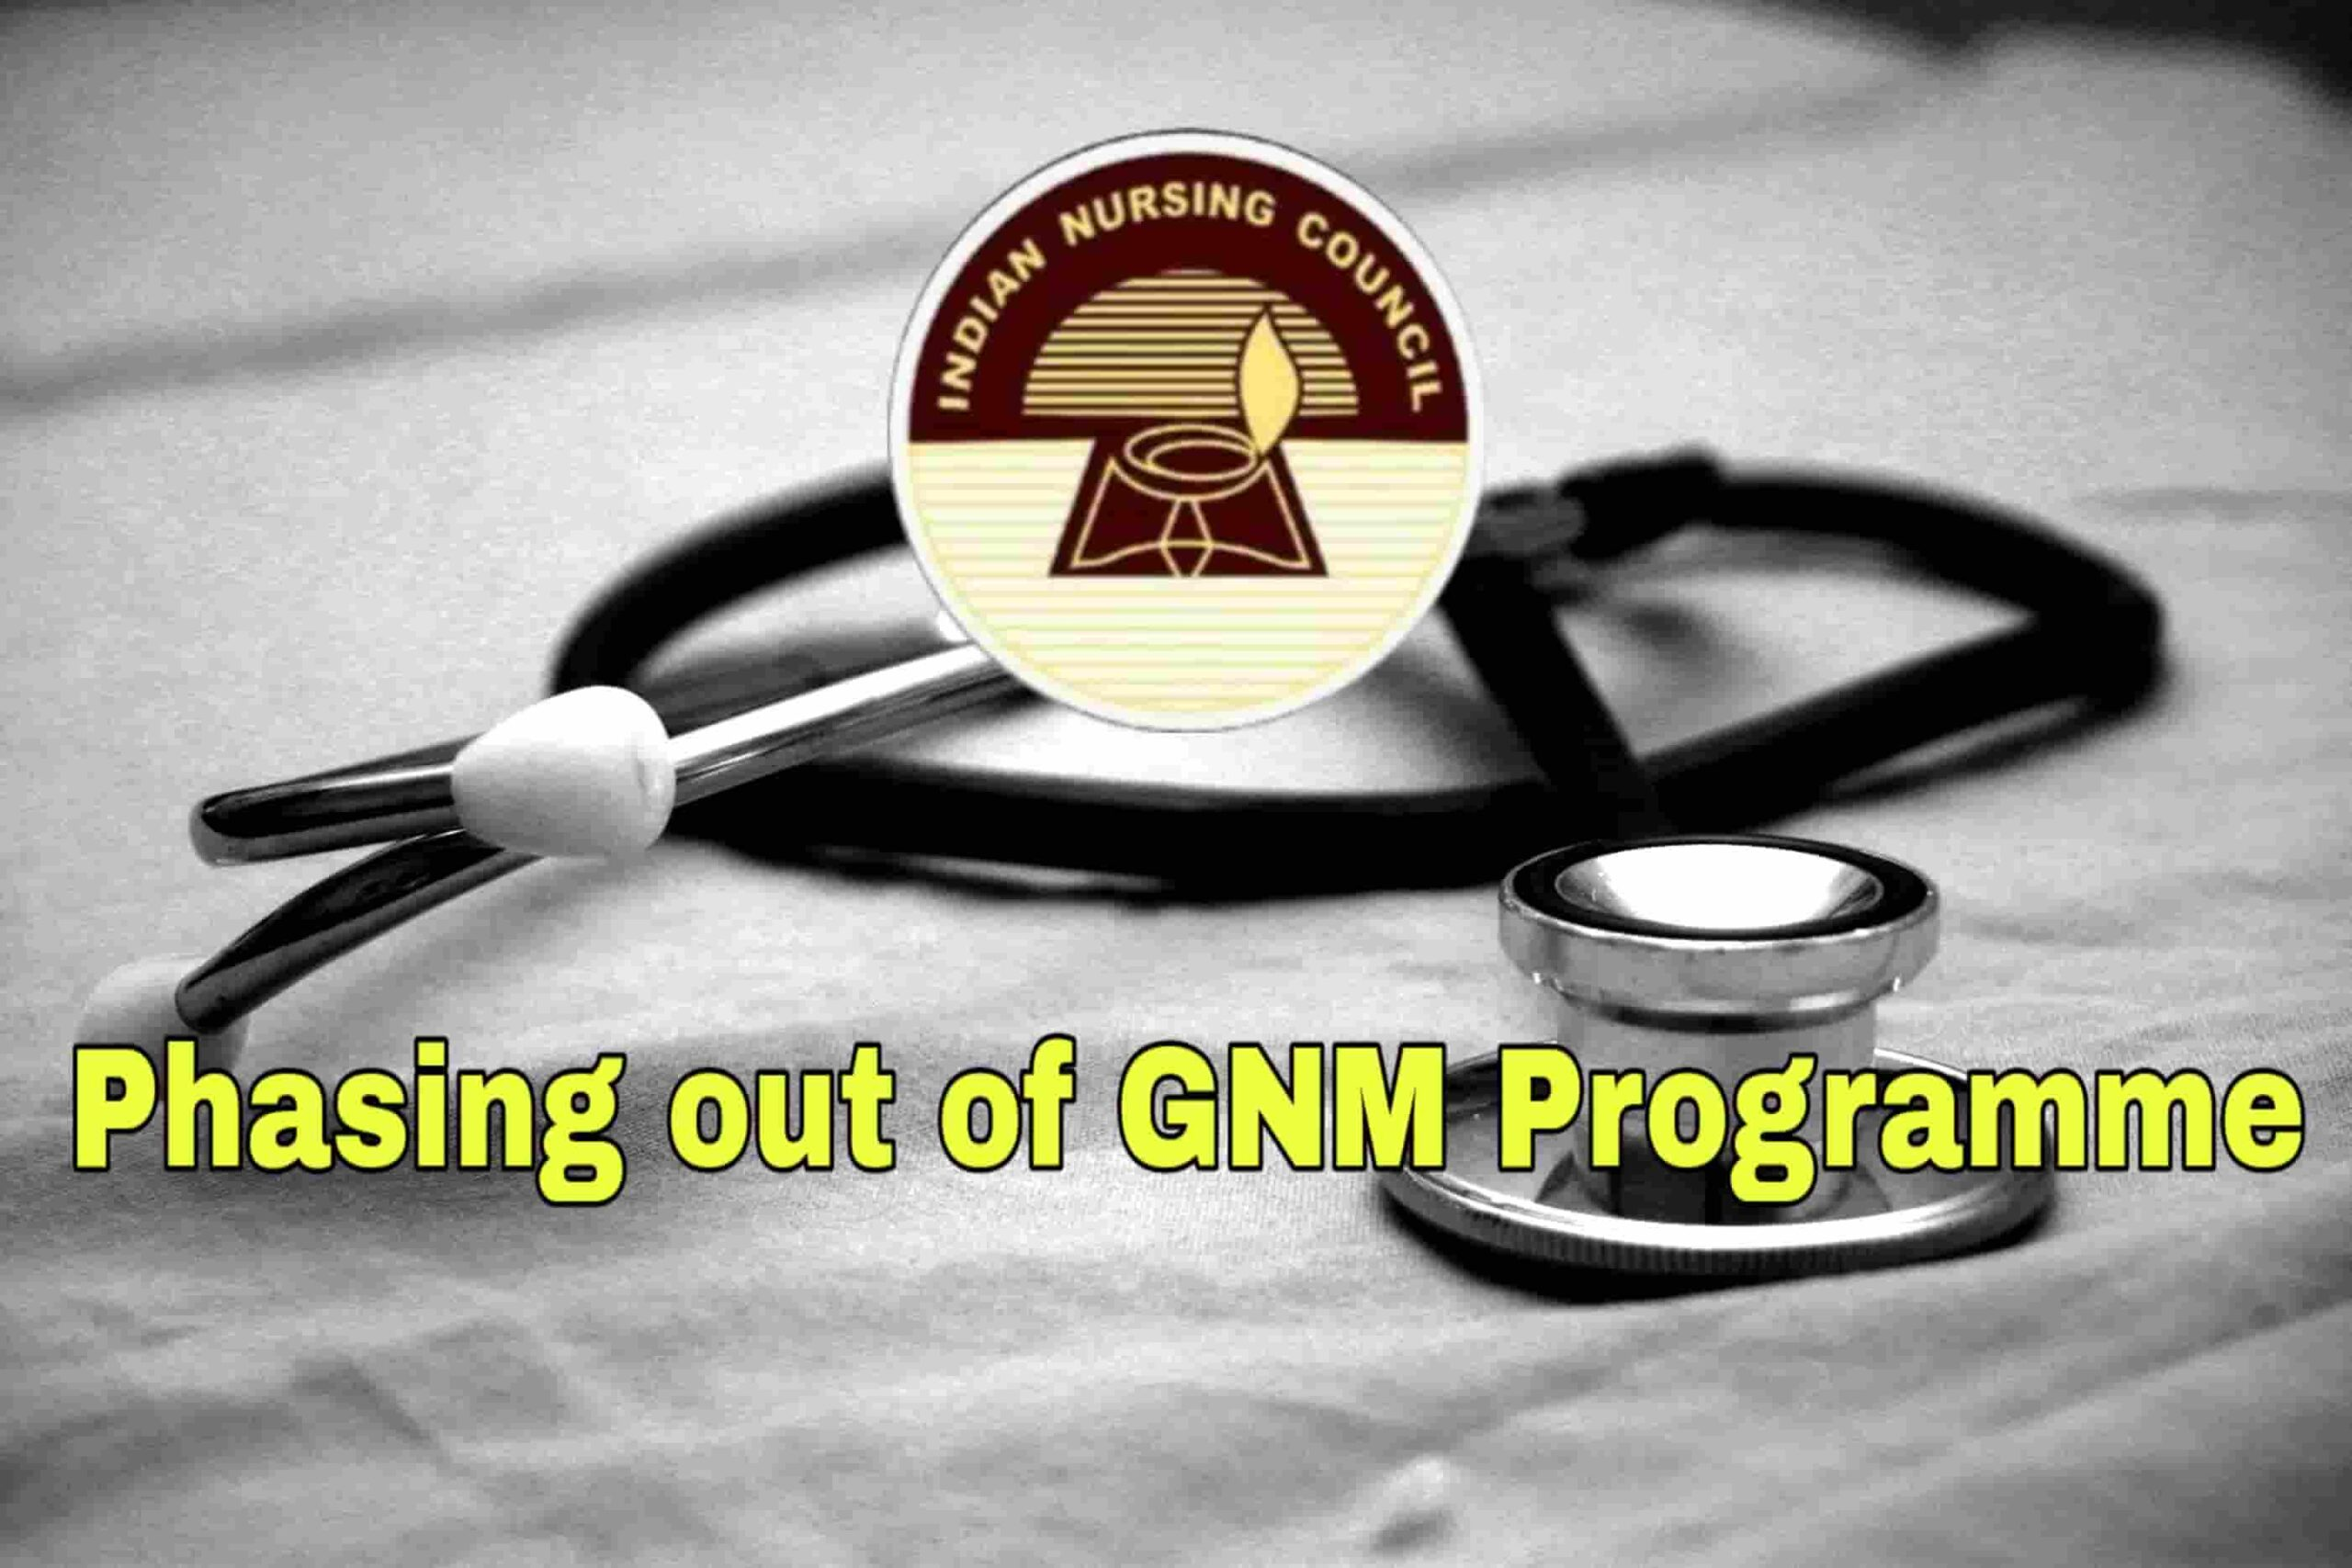 GNM Nursing Course